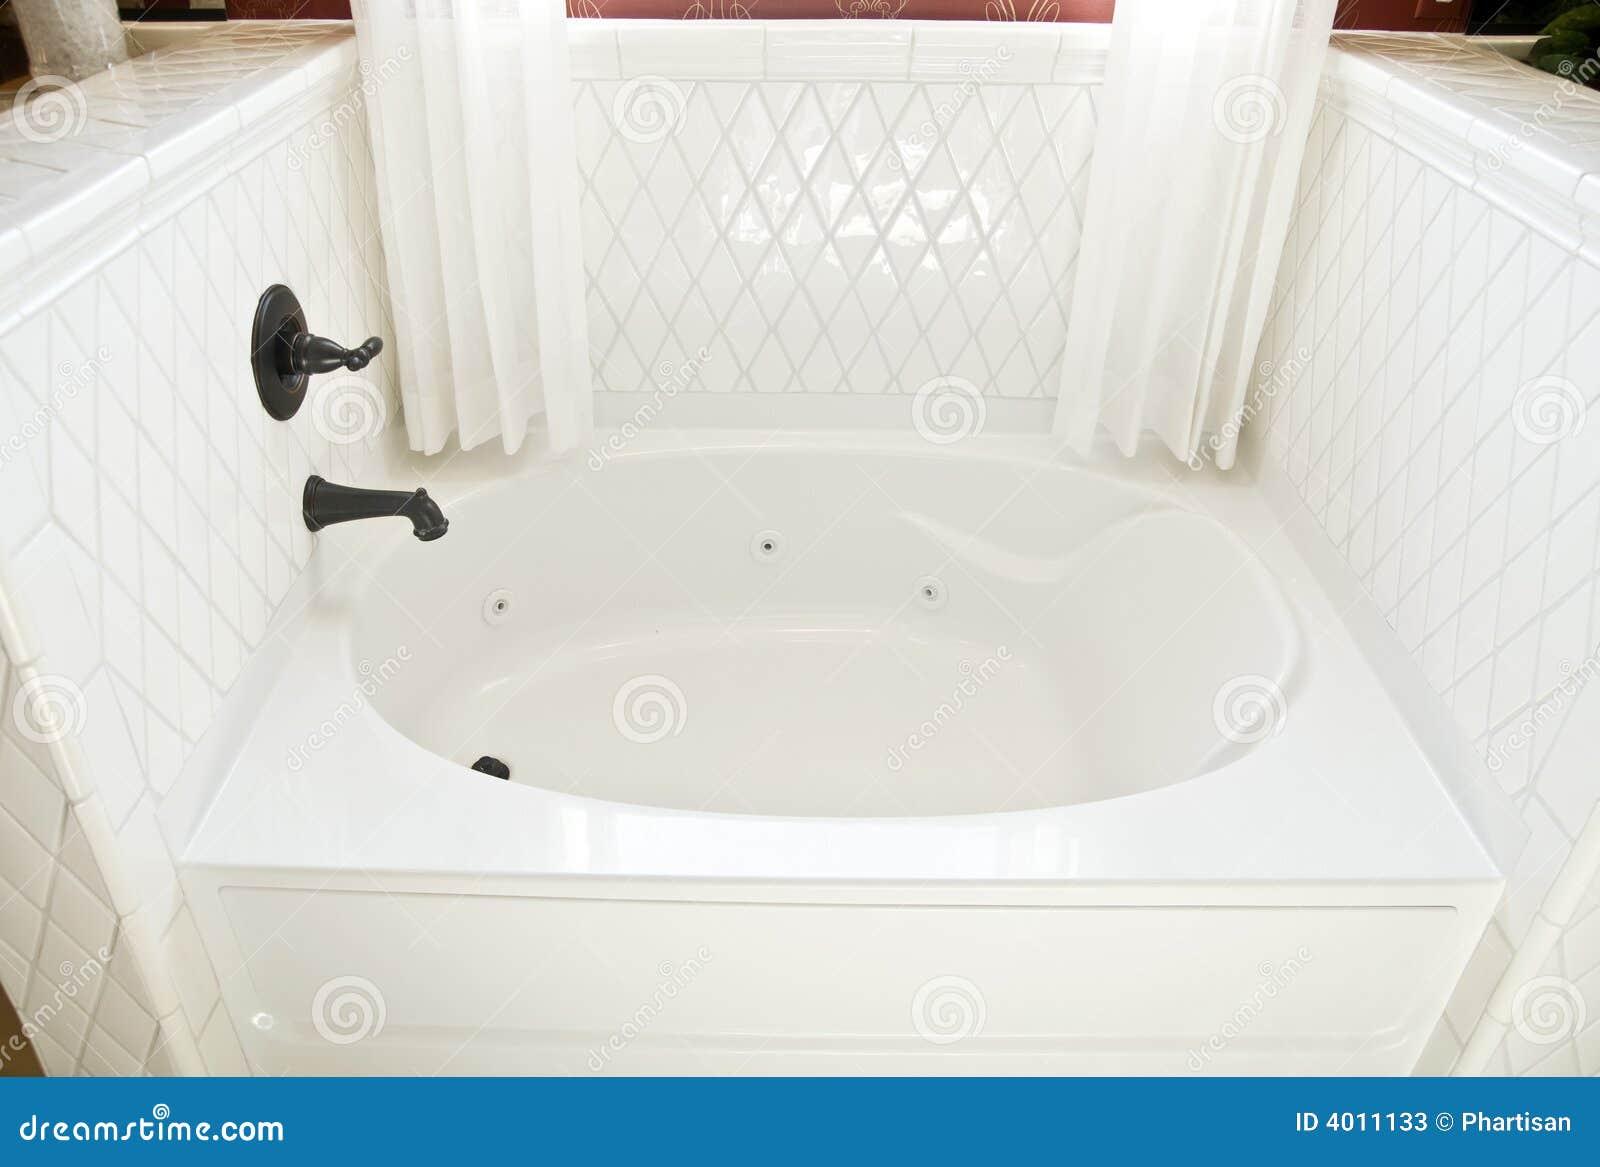 Showcase Bathroom Stock Photos Image 4011133